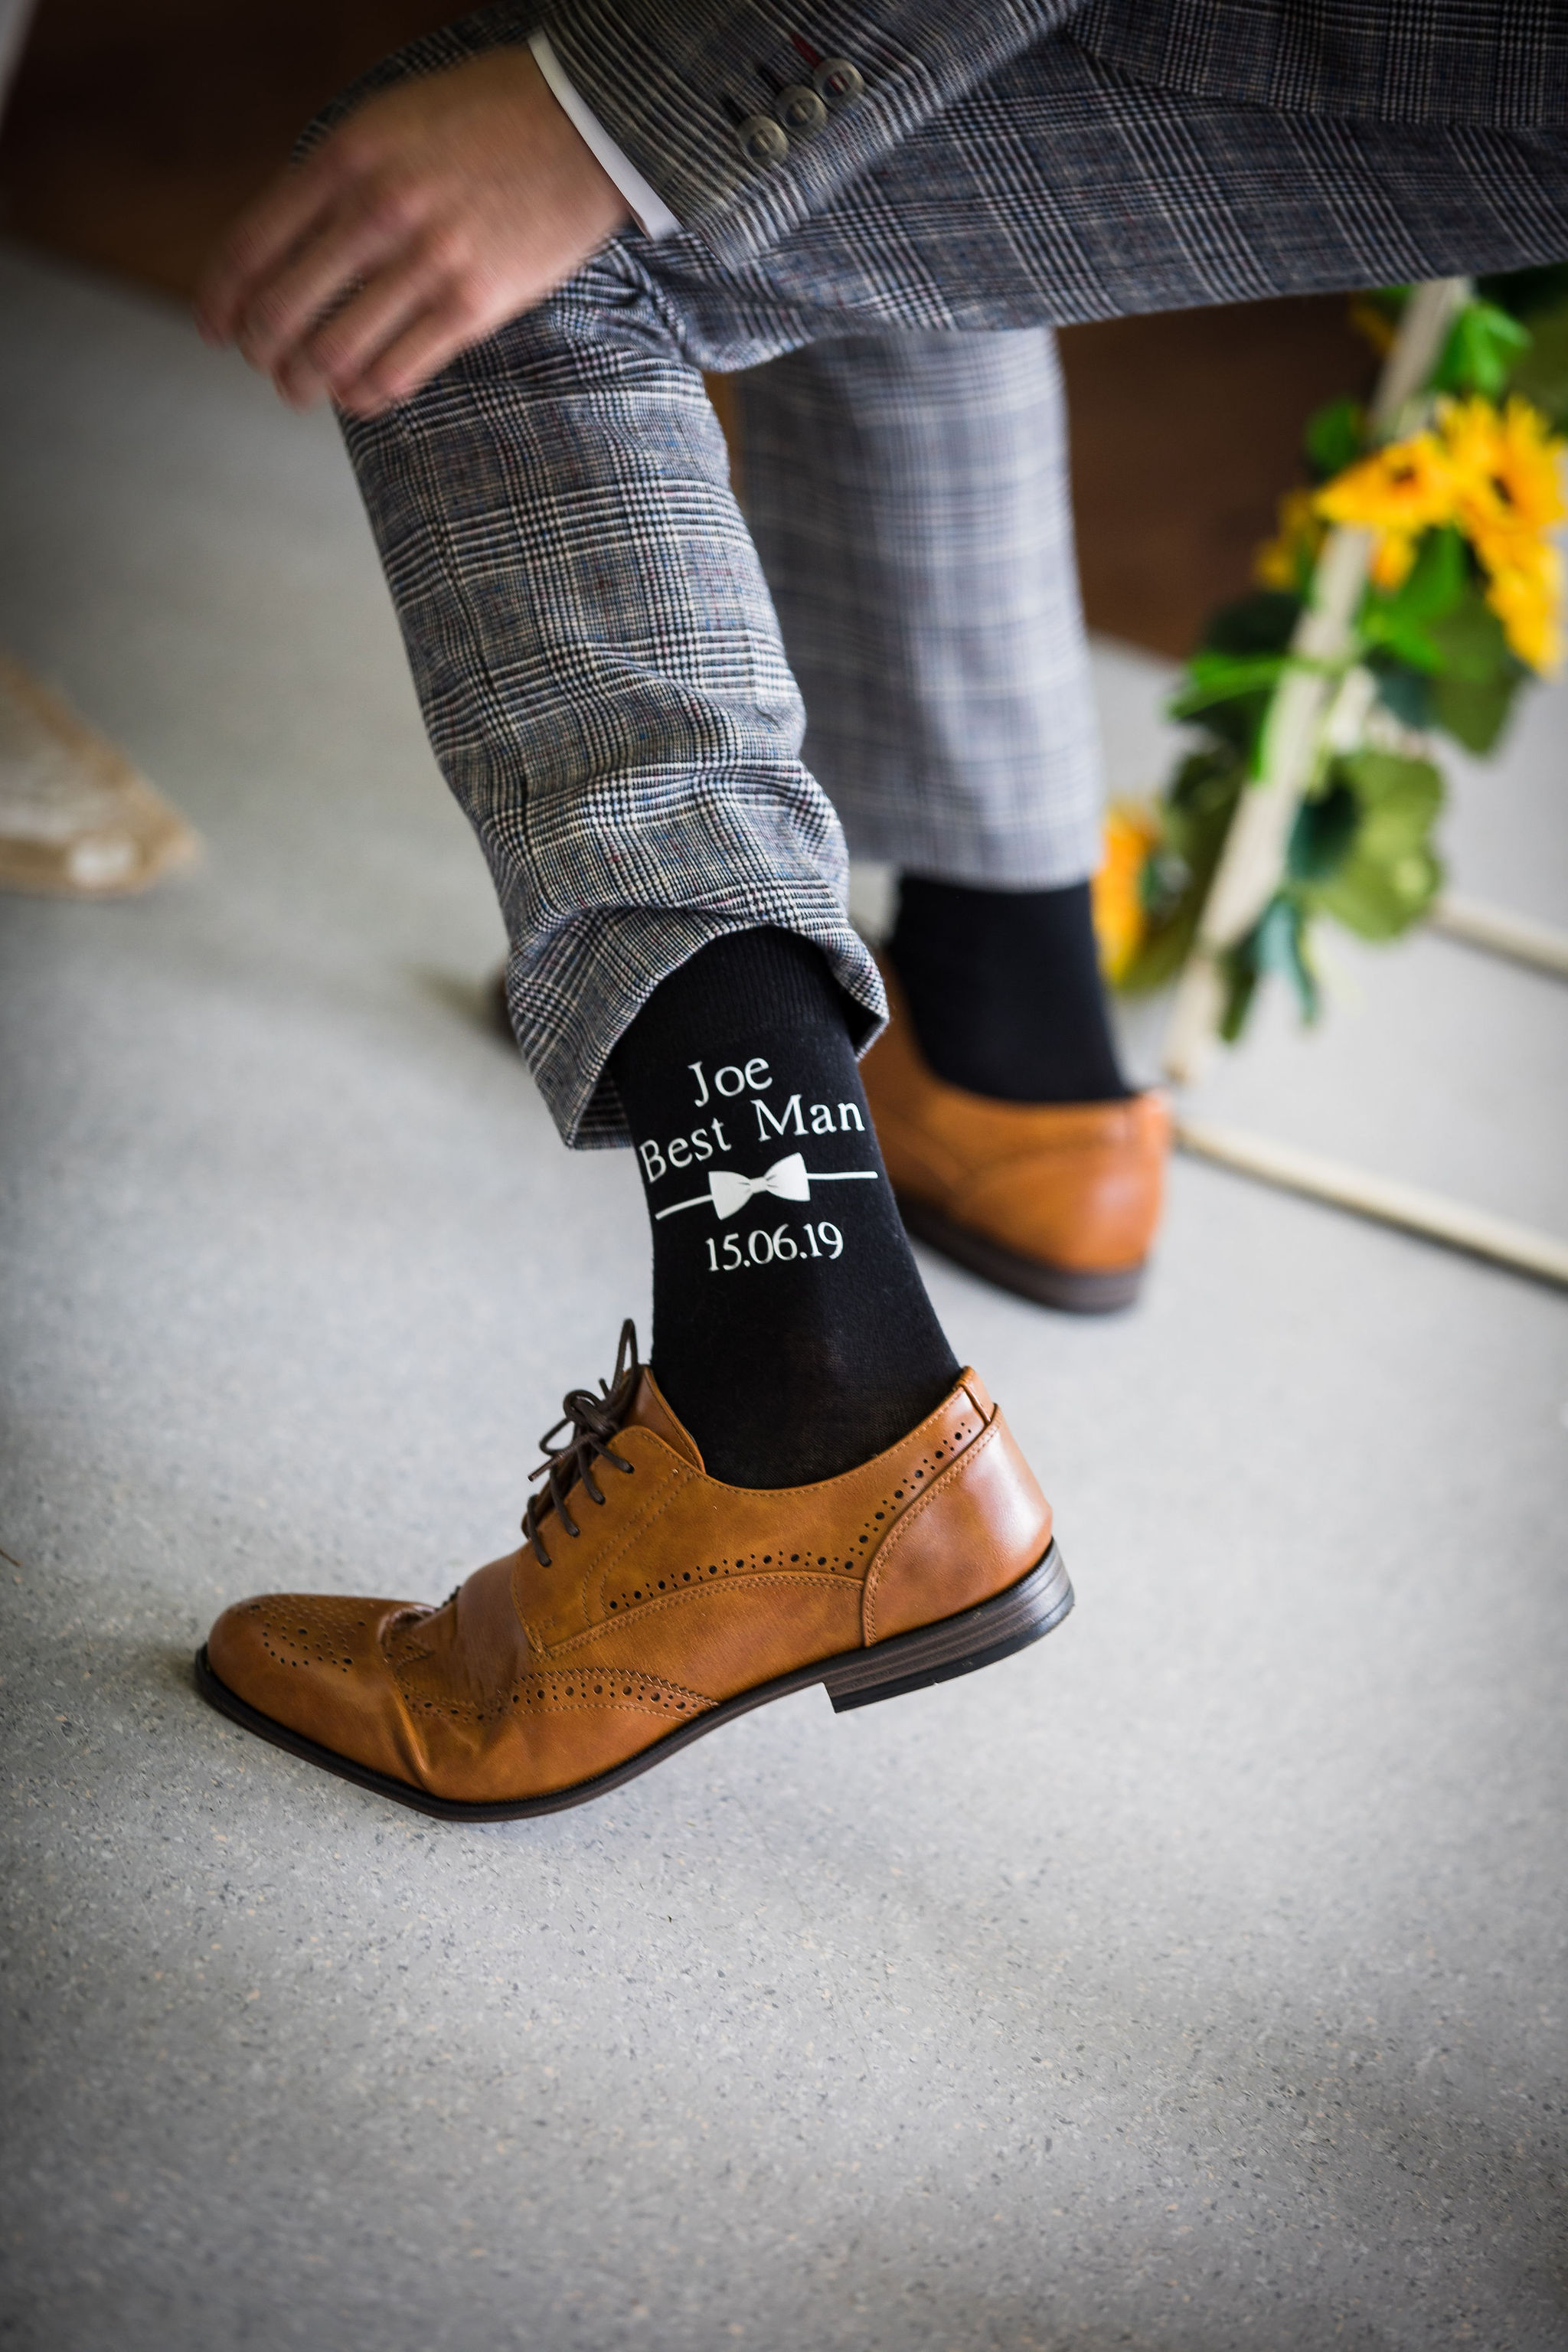 Harriet&Rhys Wedding - Best Man socks